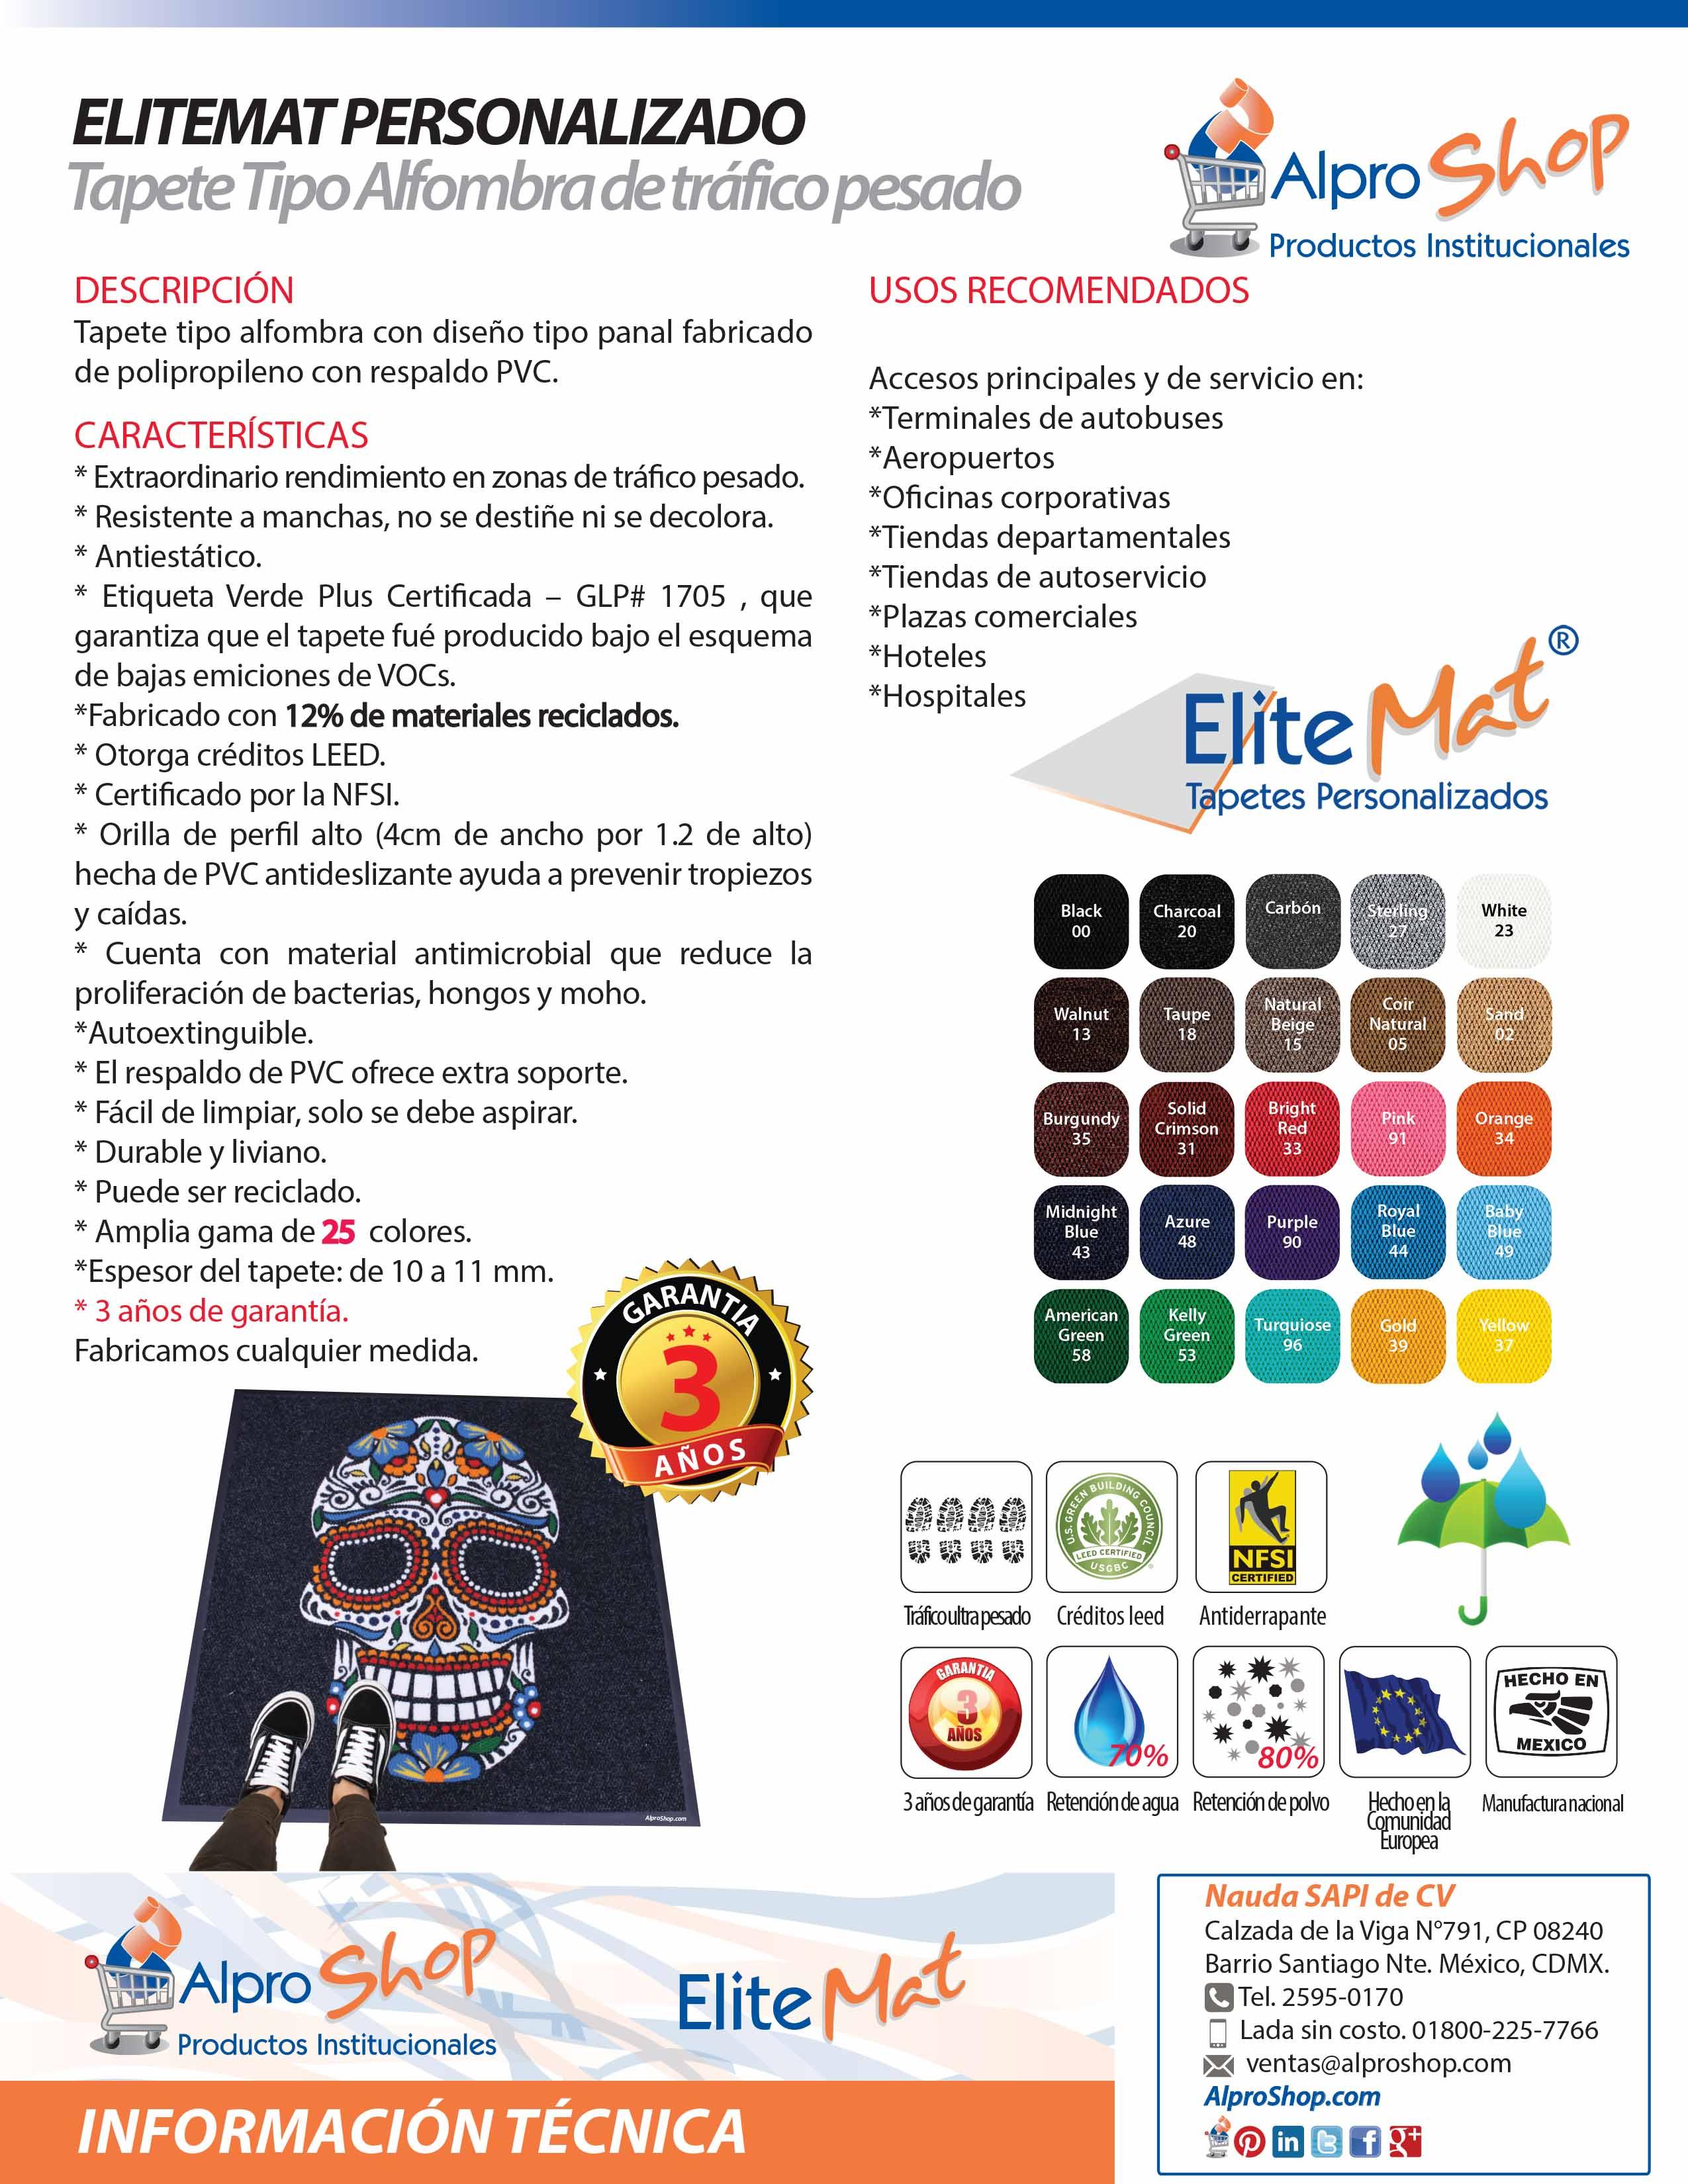 elitemat-personalizado-perfil-alto-2019-1-.jpg